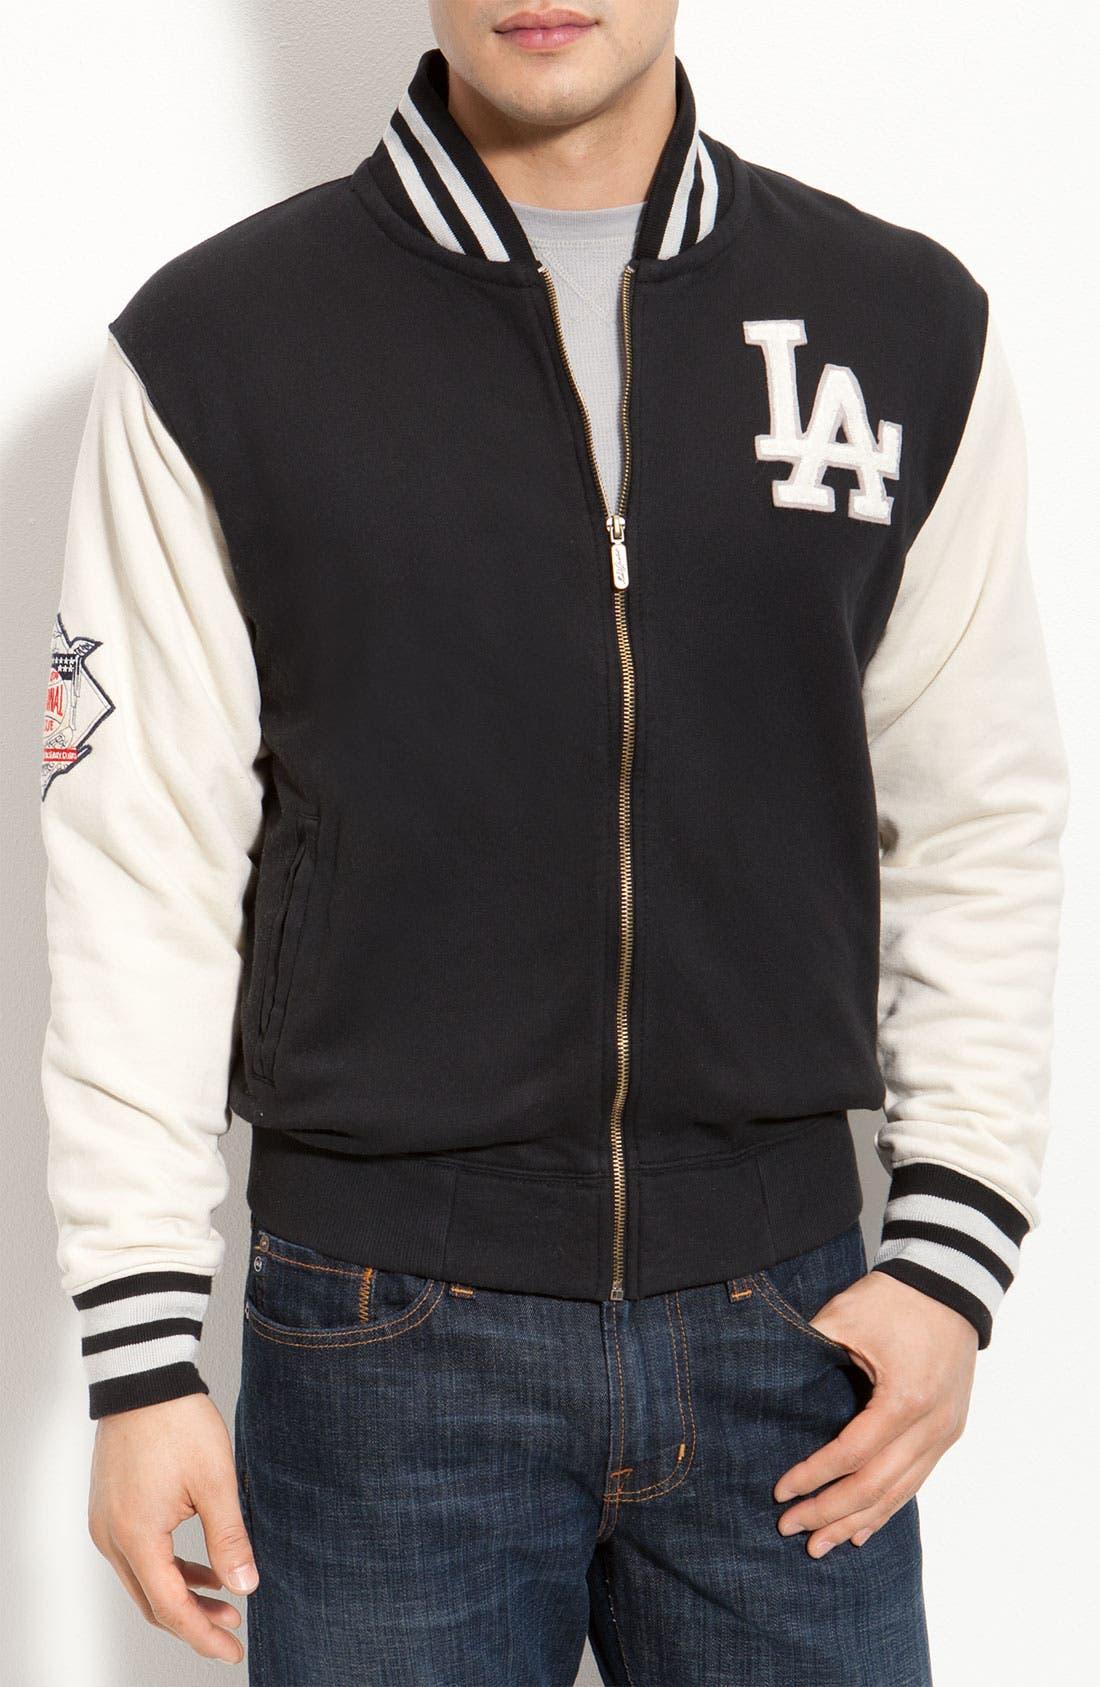 Main Image - Red Jacket 'Los Angeles Dodgers - Homeroom' Jacket